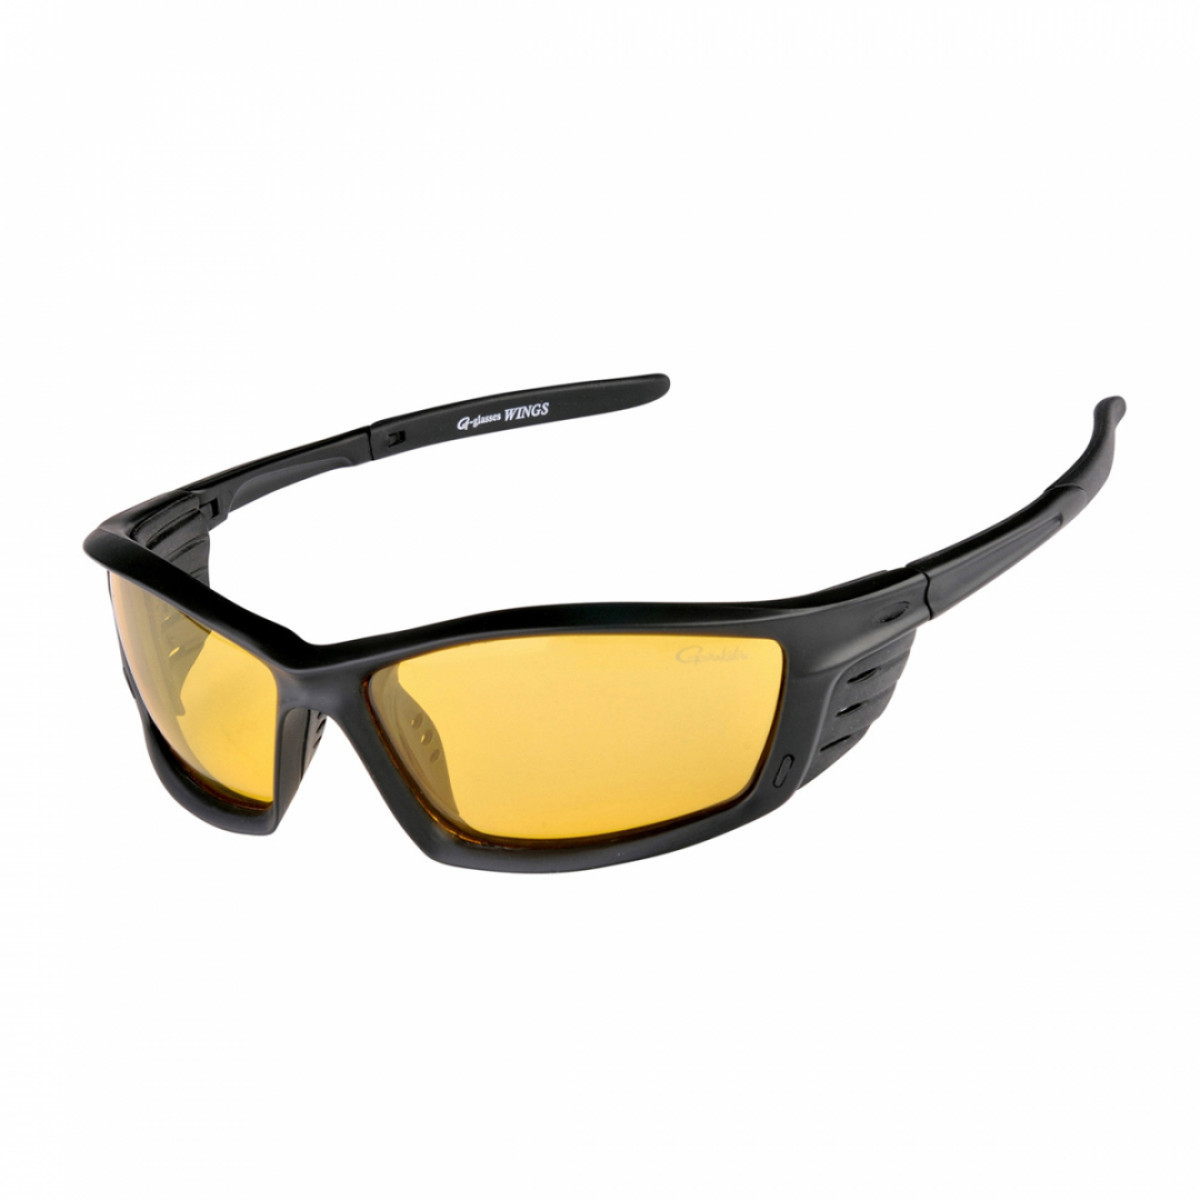 occhiali da sole gamakatsu wild